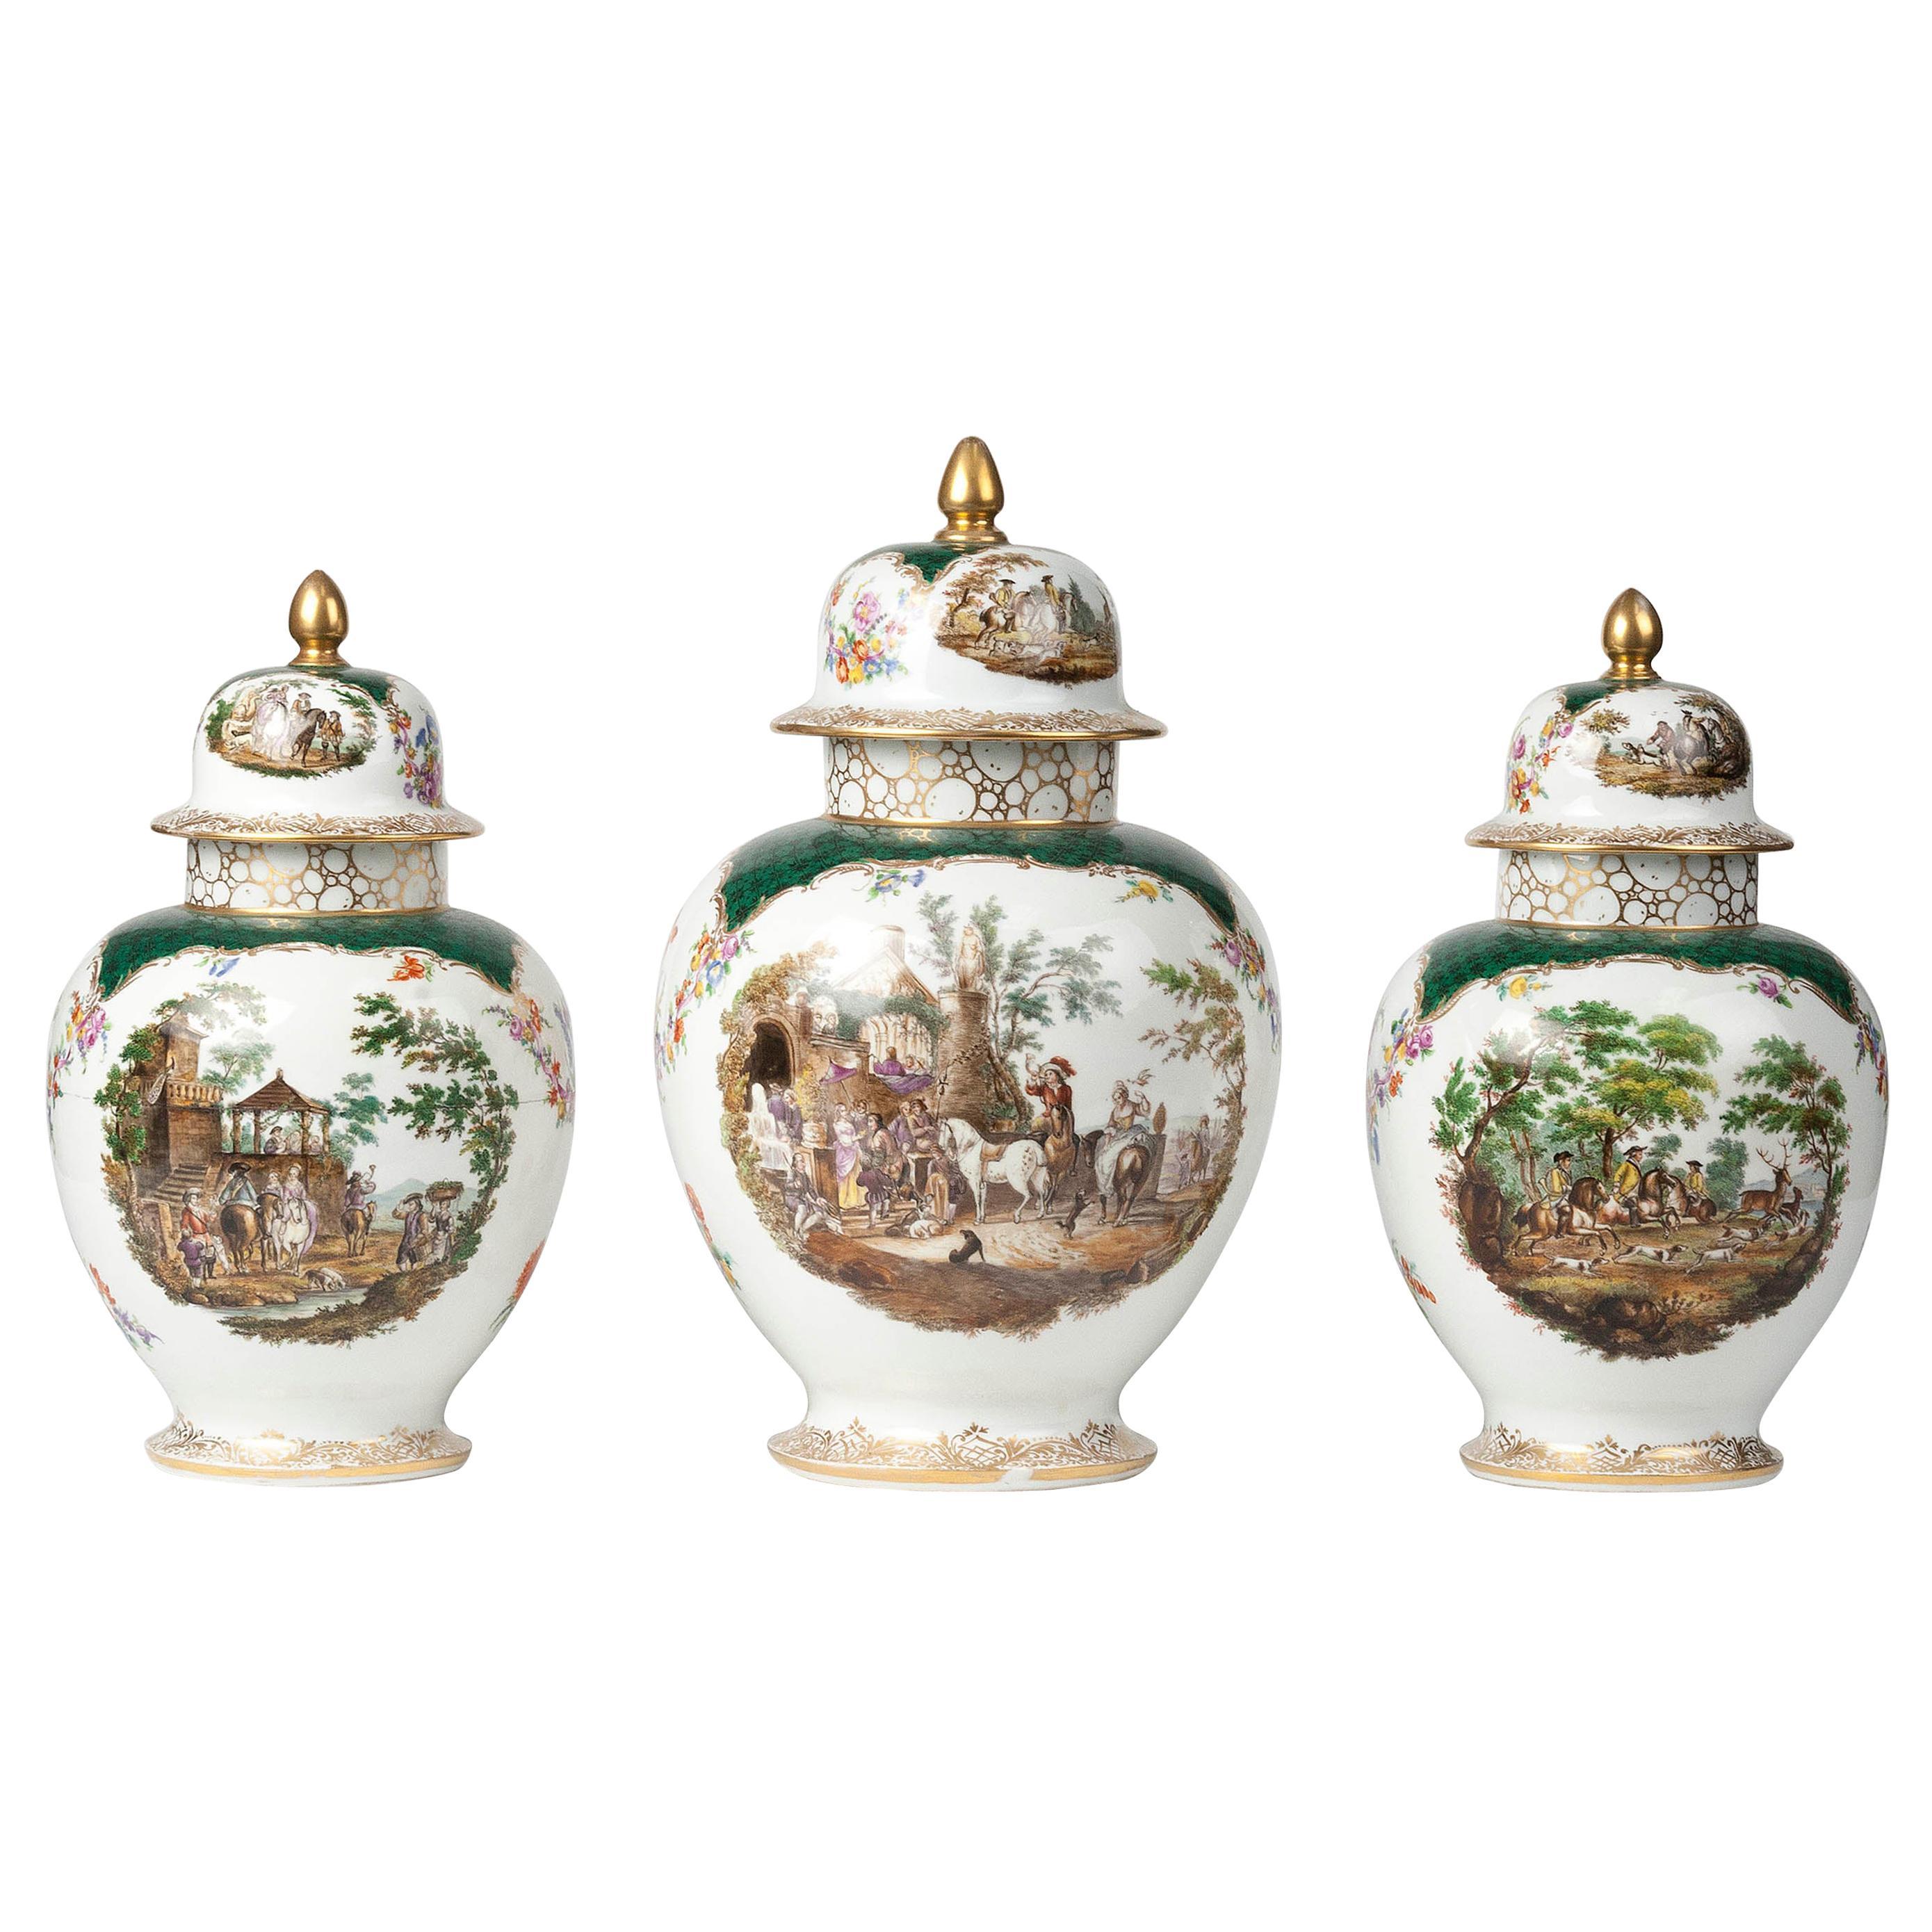 19th Century Porcelain Vases by Helena Wolfsohn, Dresden